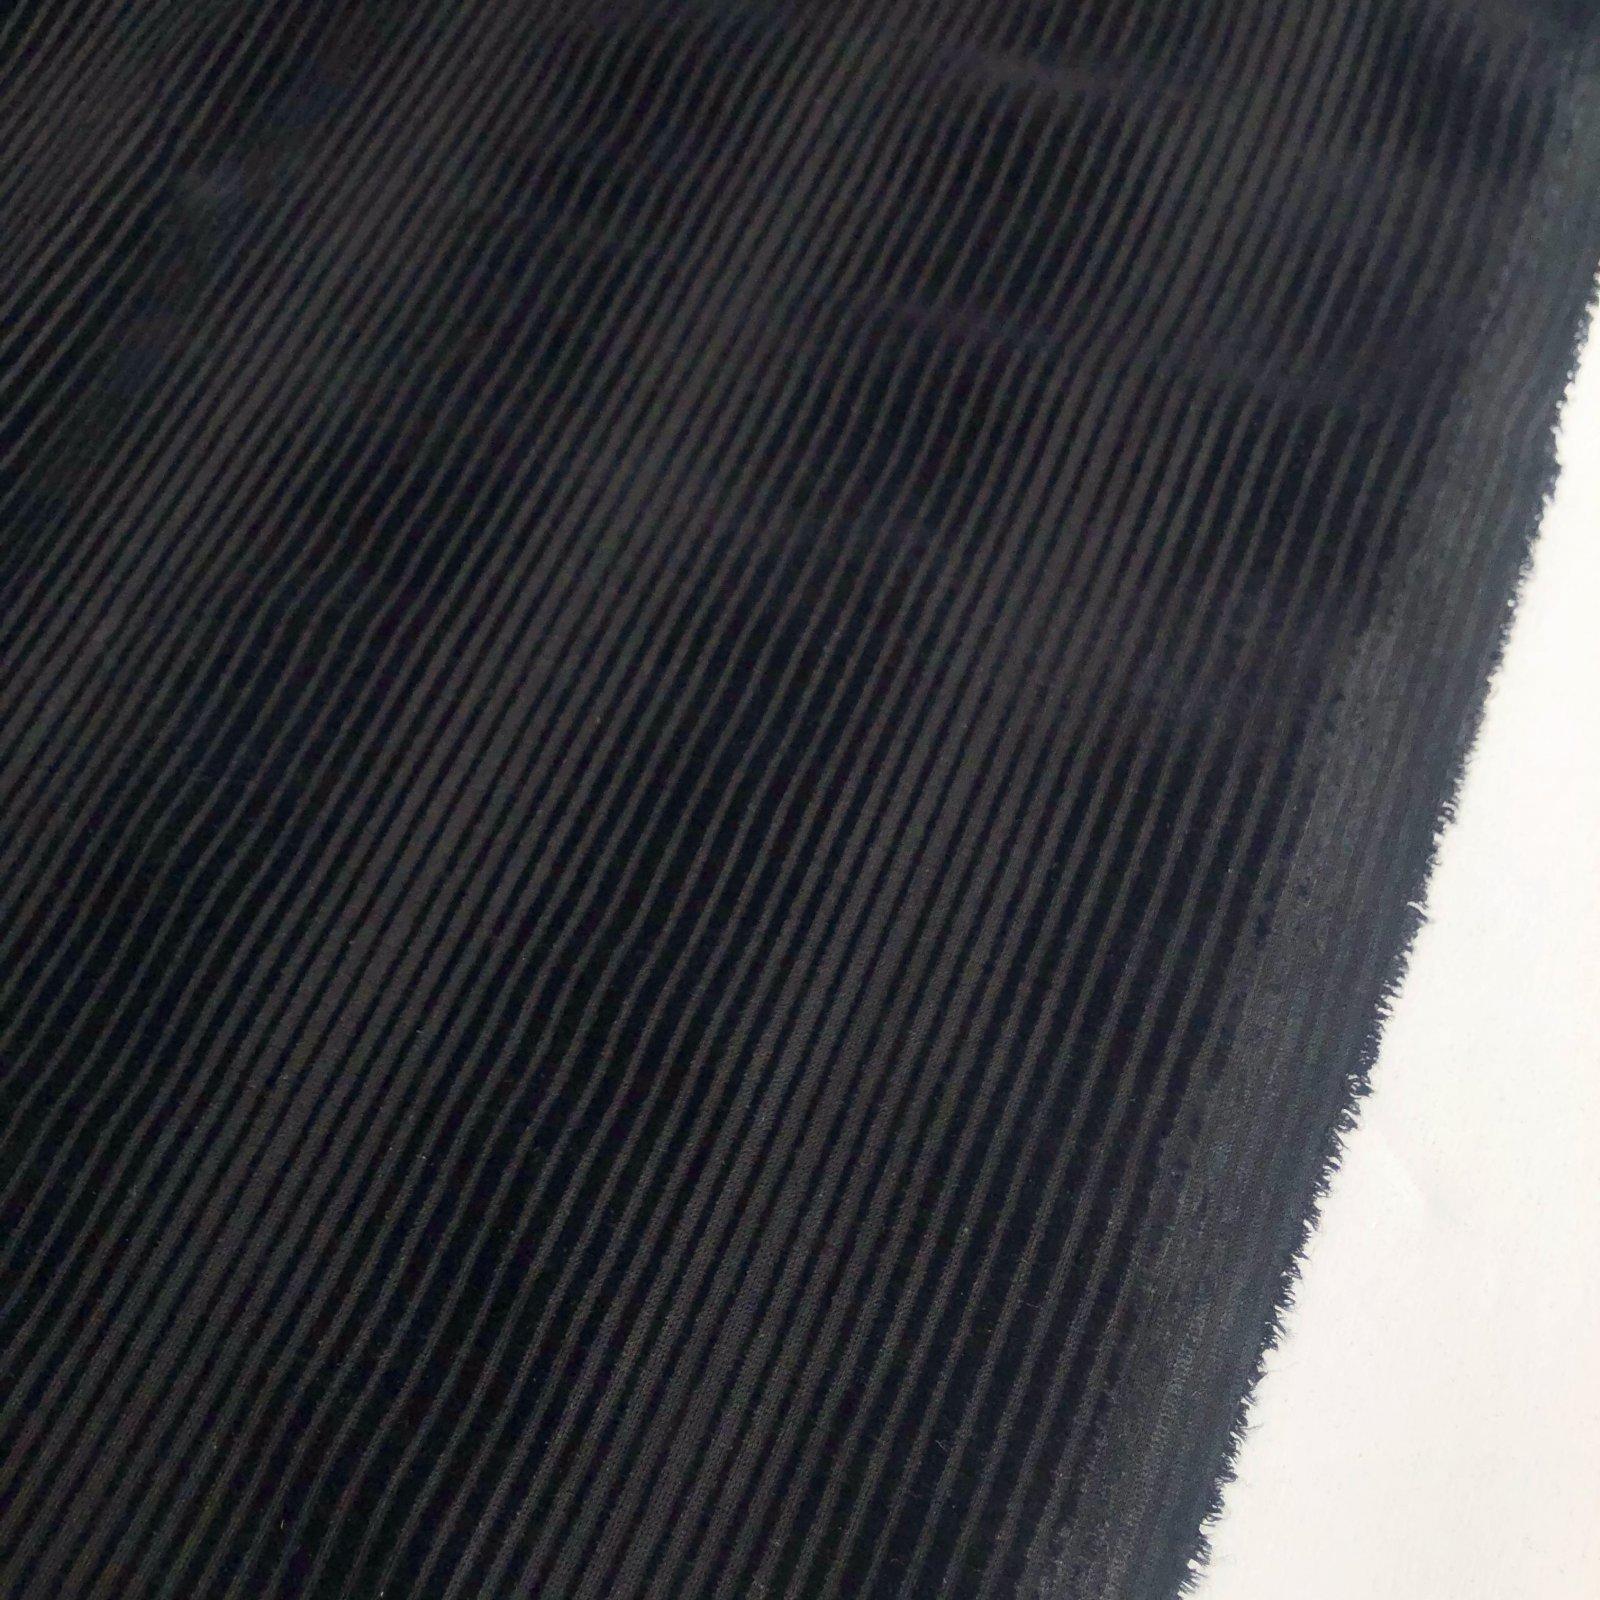 Designer Deadstock Burnout Corduroy - Black